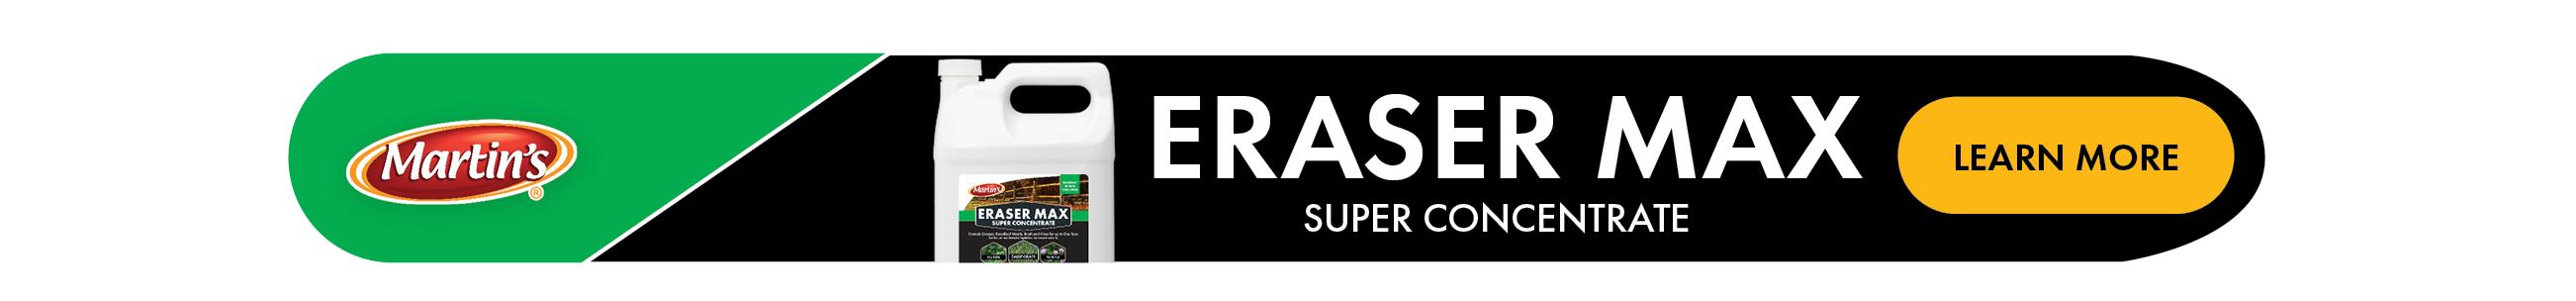 Eraser Max CTA